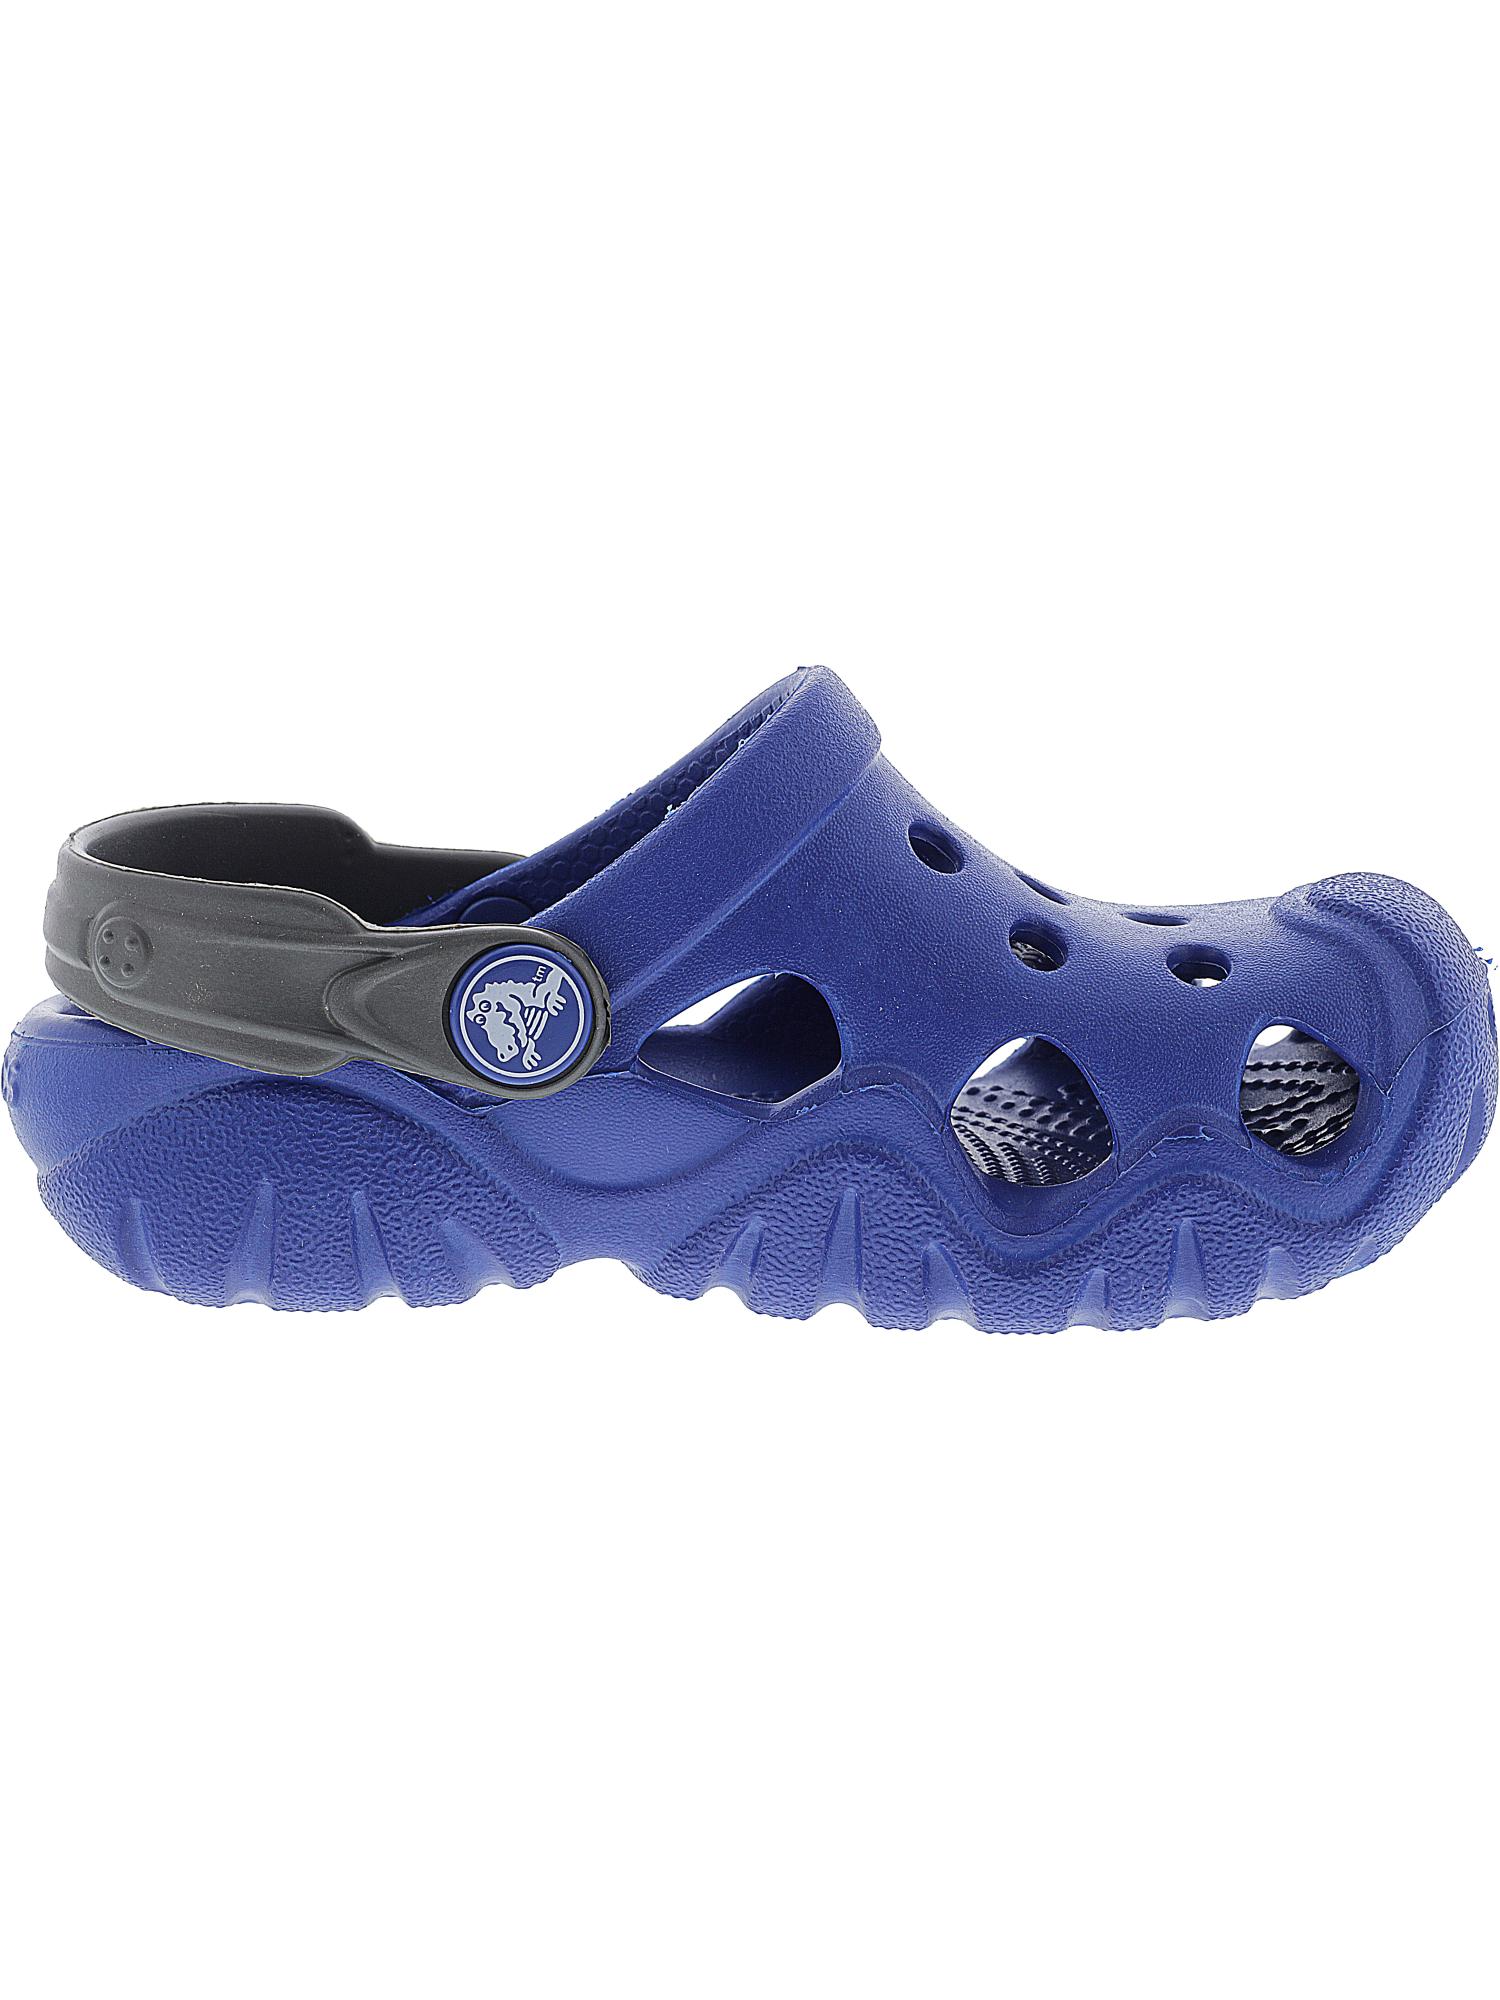 Crocs-Kids-Swiftwater-Clog-Ltd-Clogs thumbnail 8